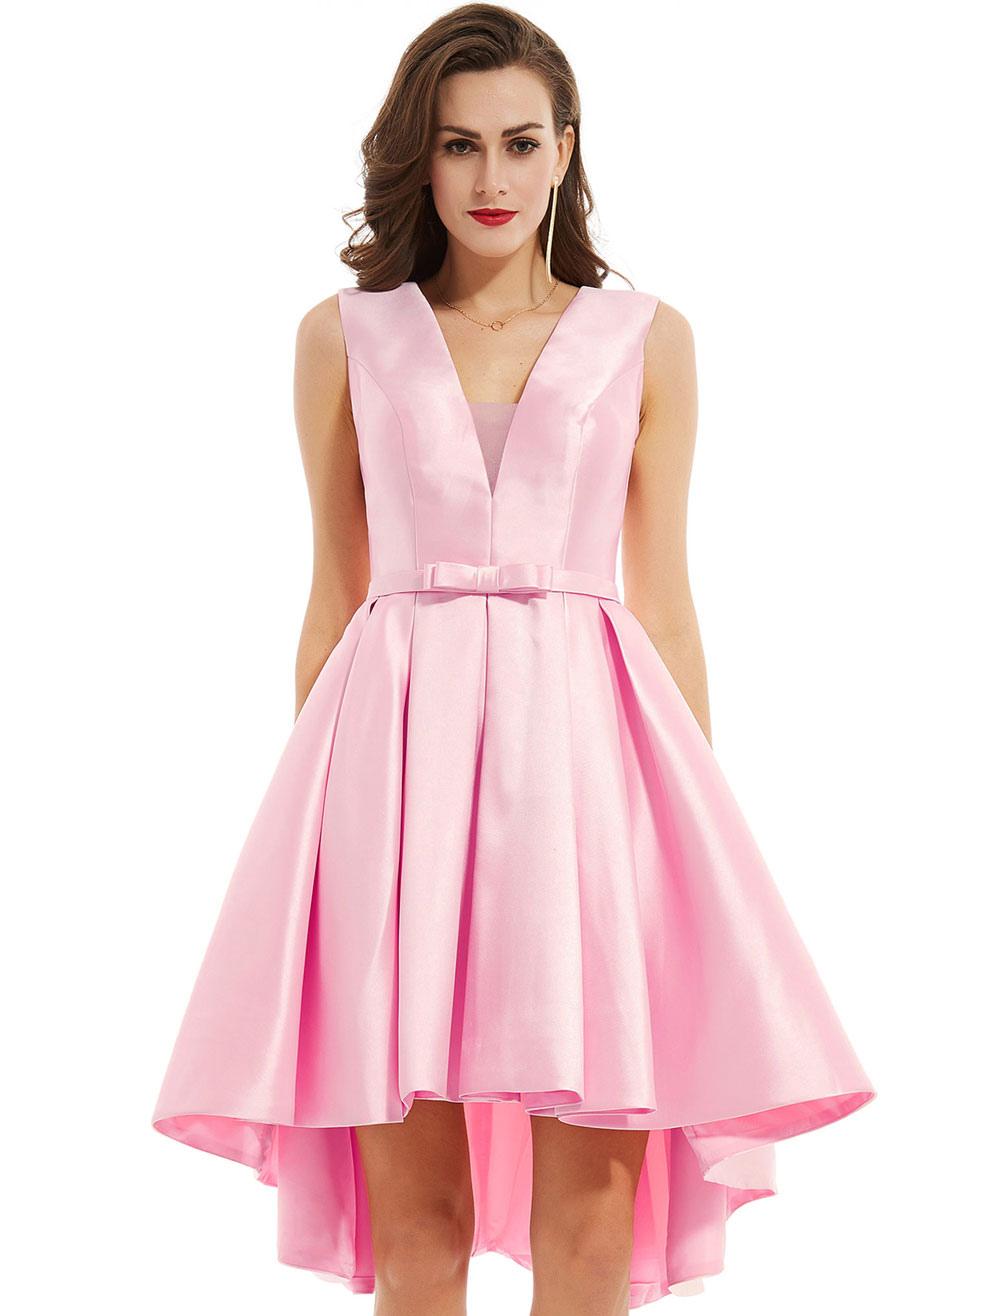 Cocktail Dress Soft Pink V Neck High Low Asymmetrical Bow Sash Short Graduation Party Dress (Wedding Cheap Party Dress) photo